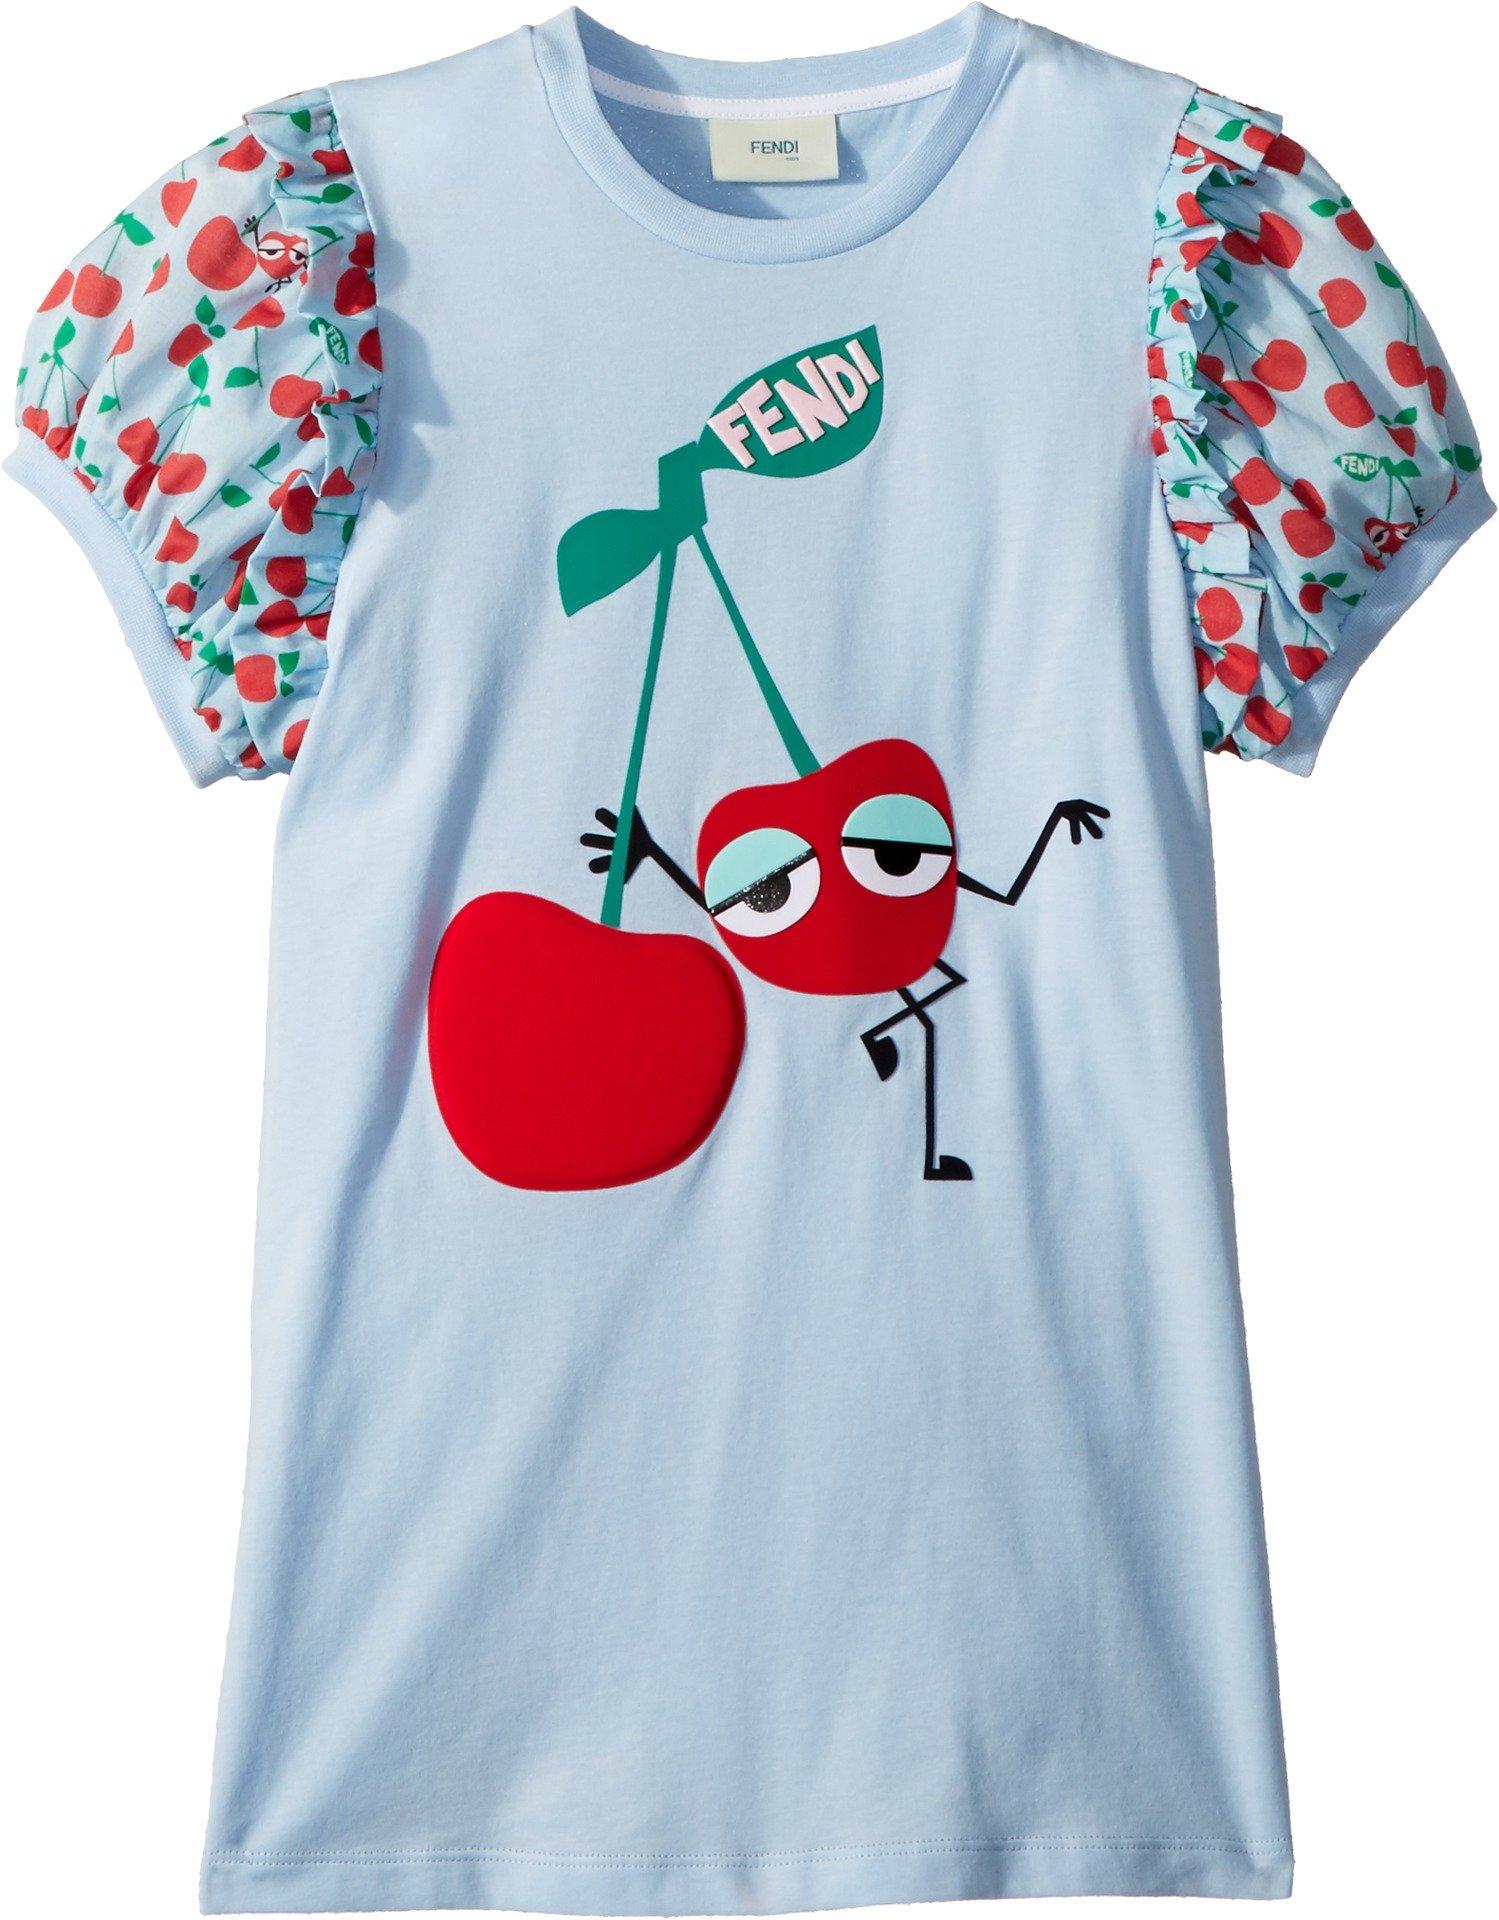 Fendi Kids Girl's Cherry Graphic T-Shirt w/Cherry Sleeves (Little Kids) Blue 8 Years